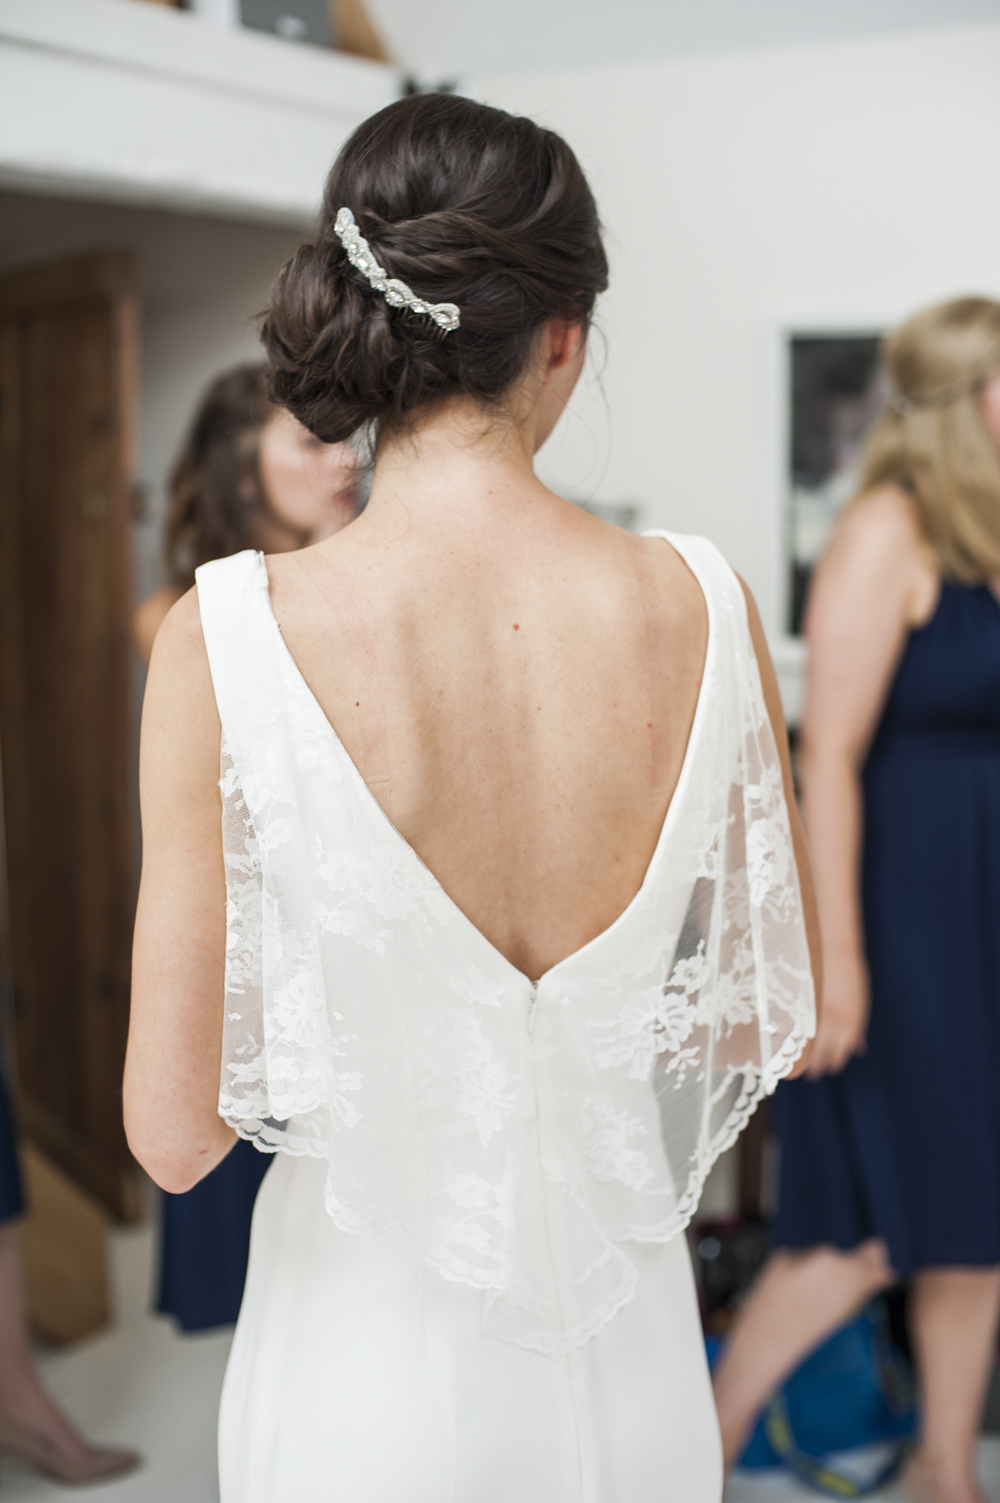 Low Back Wedding Dress With Veil : Bride in a lara hannah low back wedding dress joyce